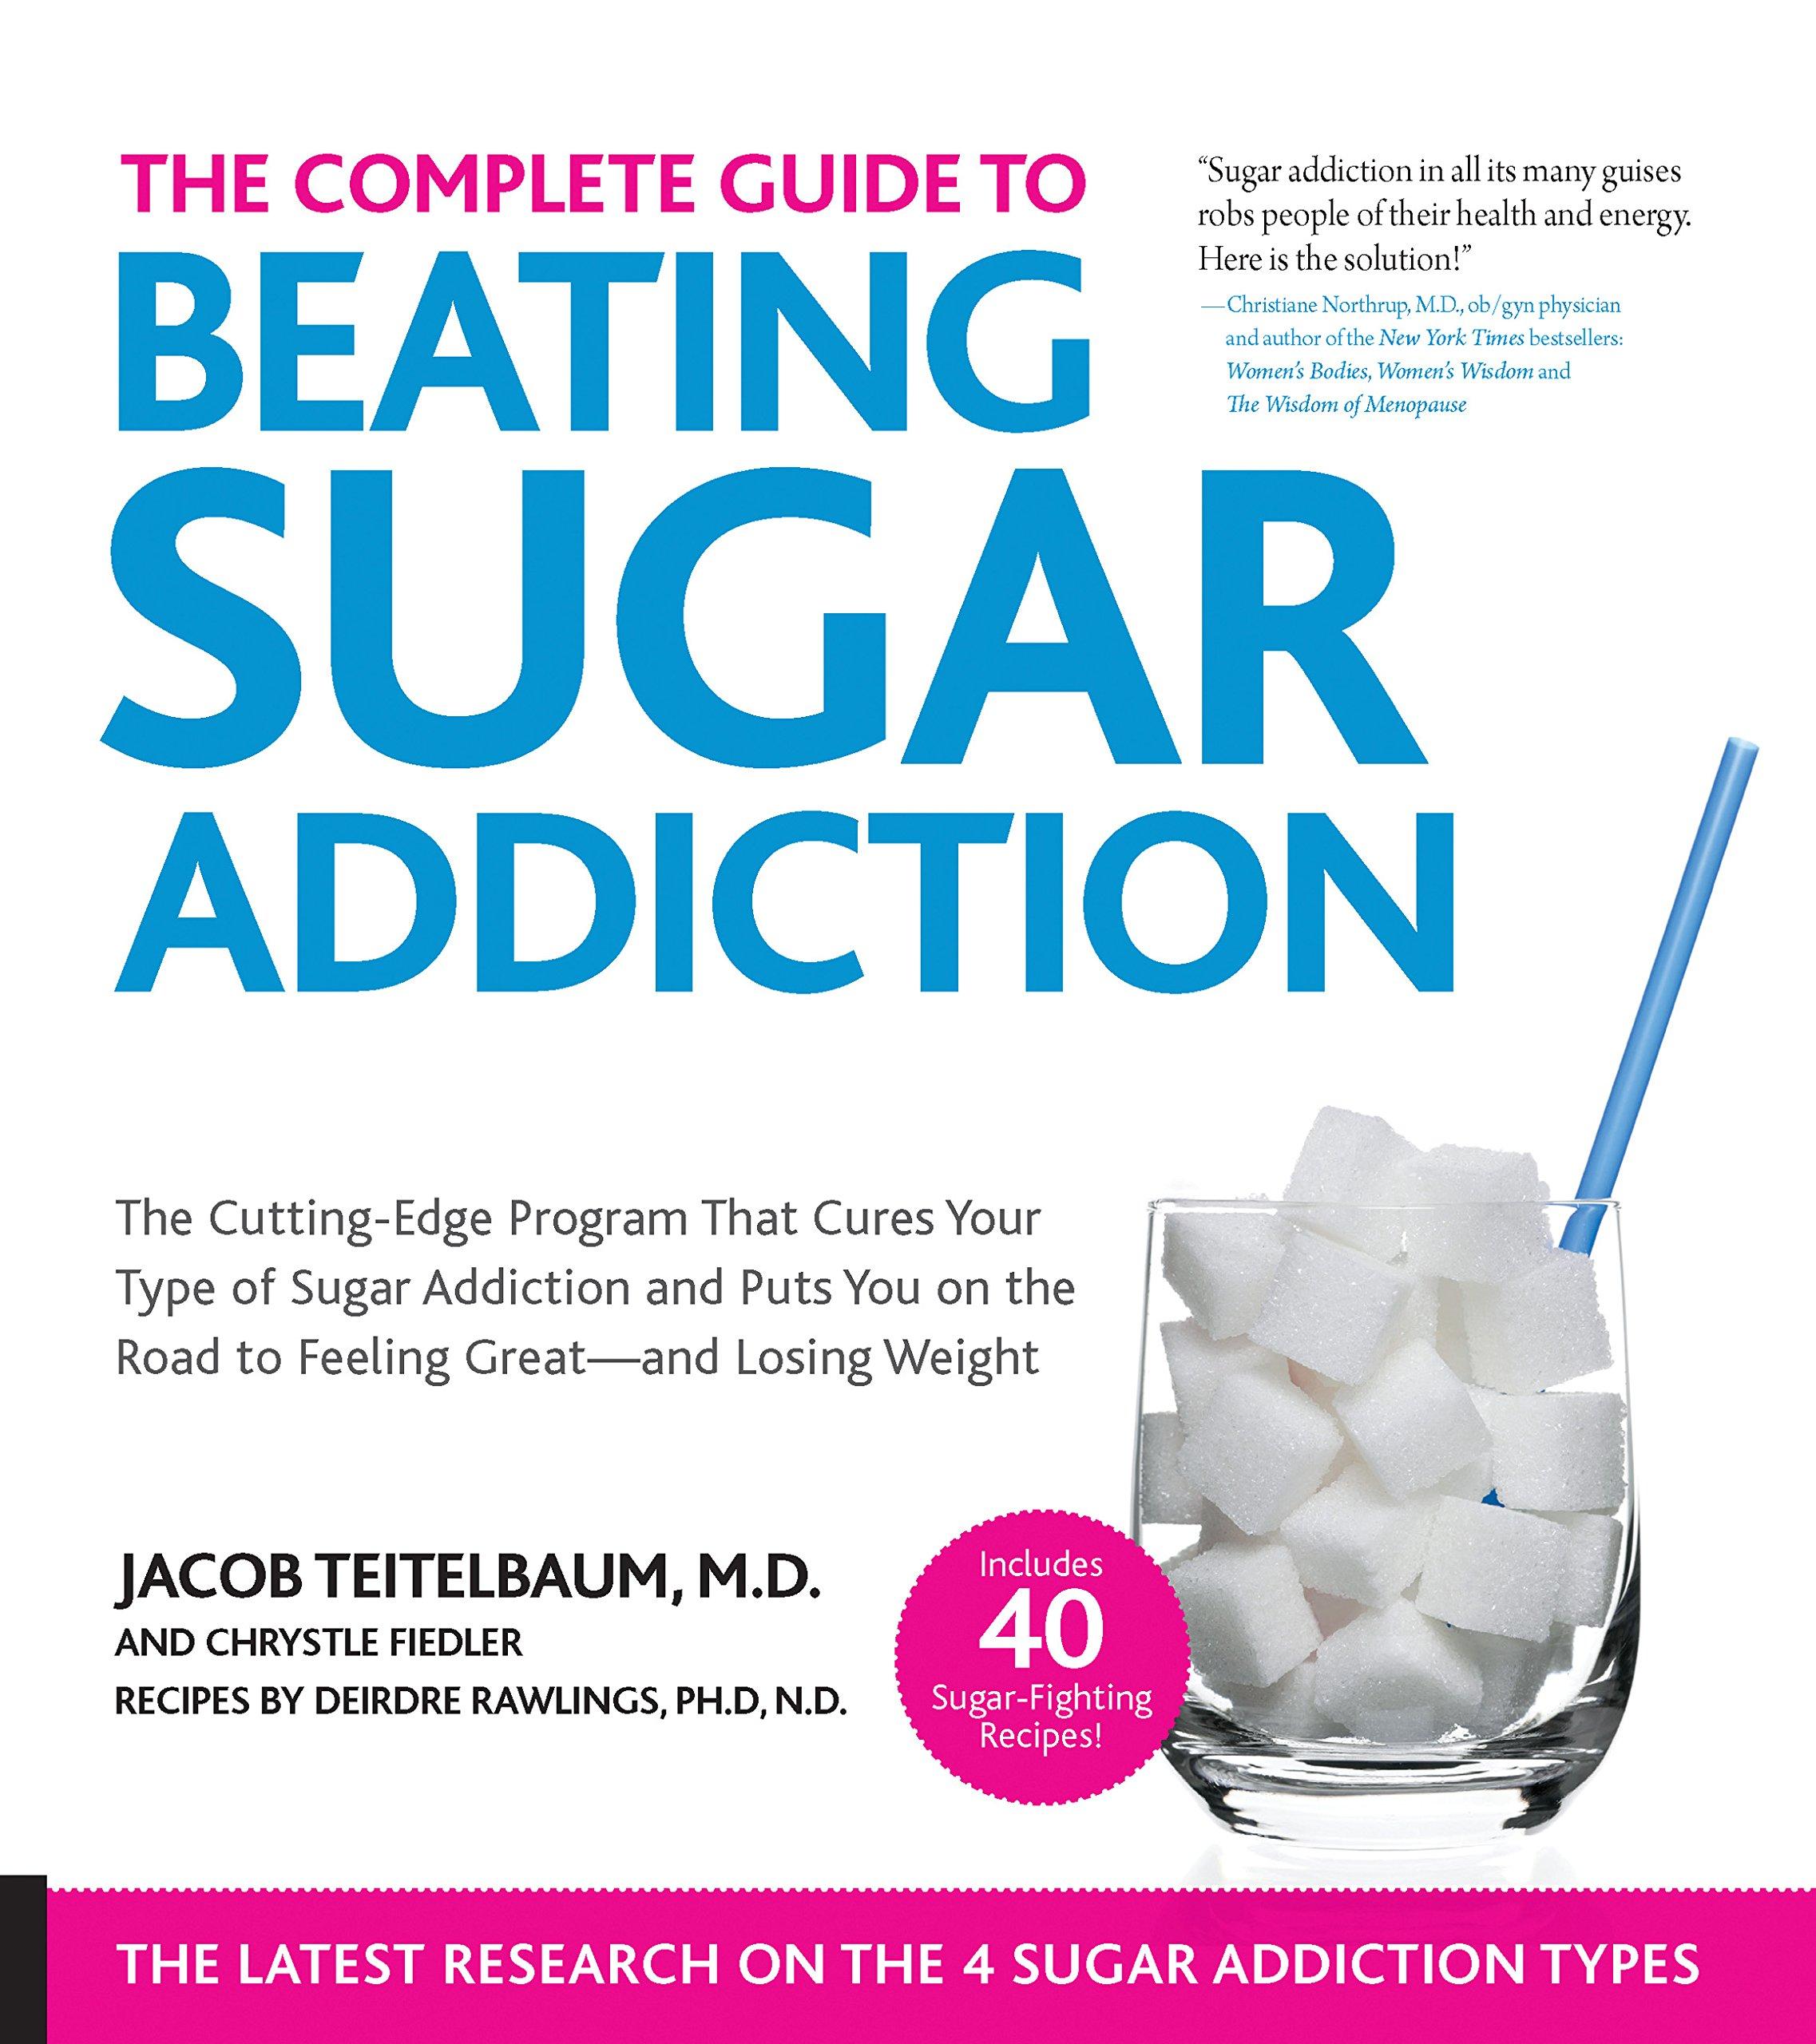 8 Ways To Beat Your Sugar Addiction 8 Ways To Beat Your Sugar Addiction new foto